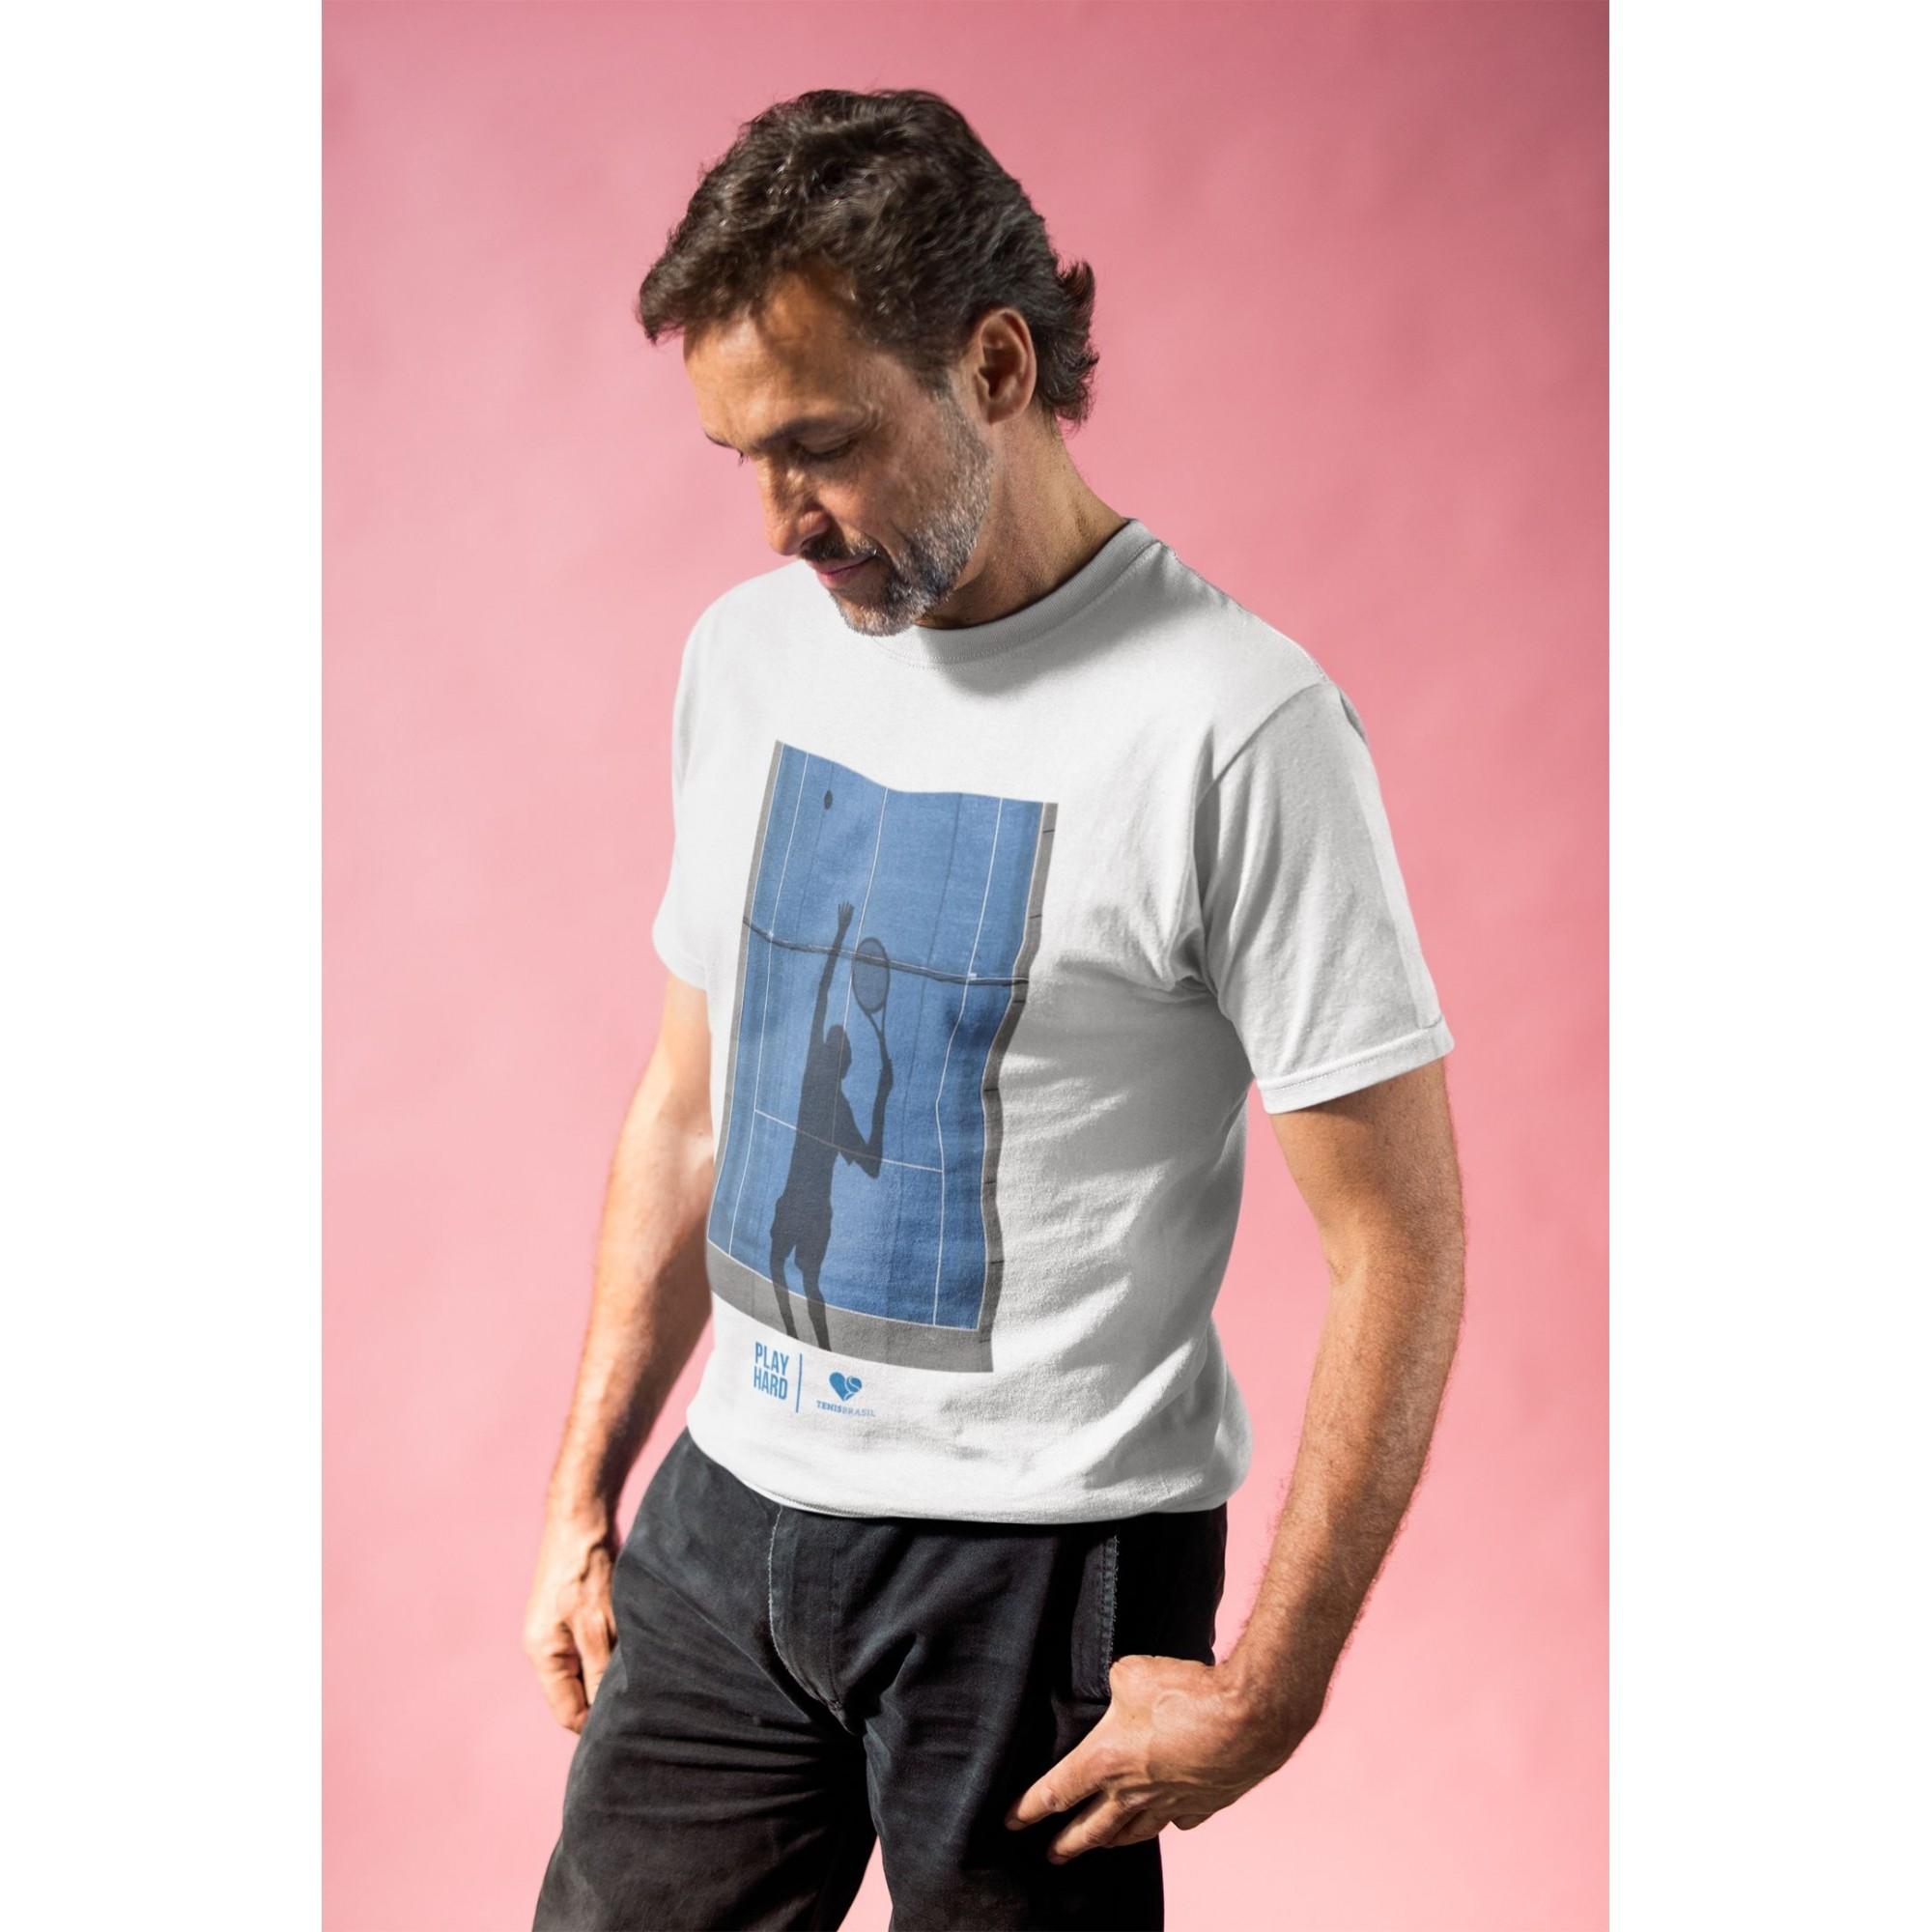 Camiseta PLAY HARD  >> MASCULINA